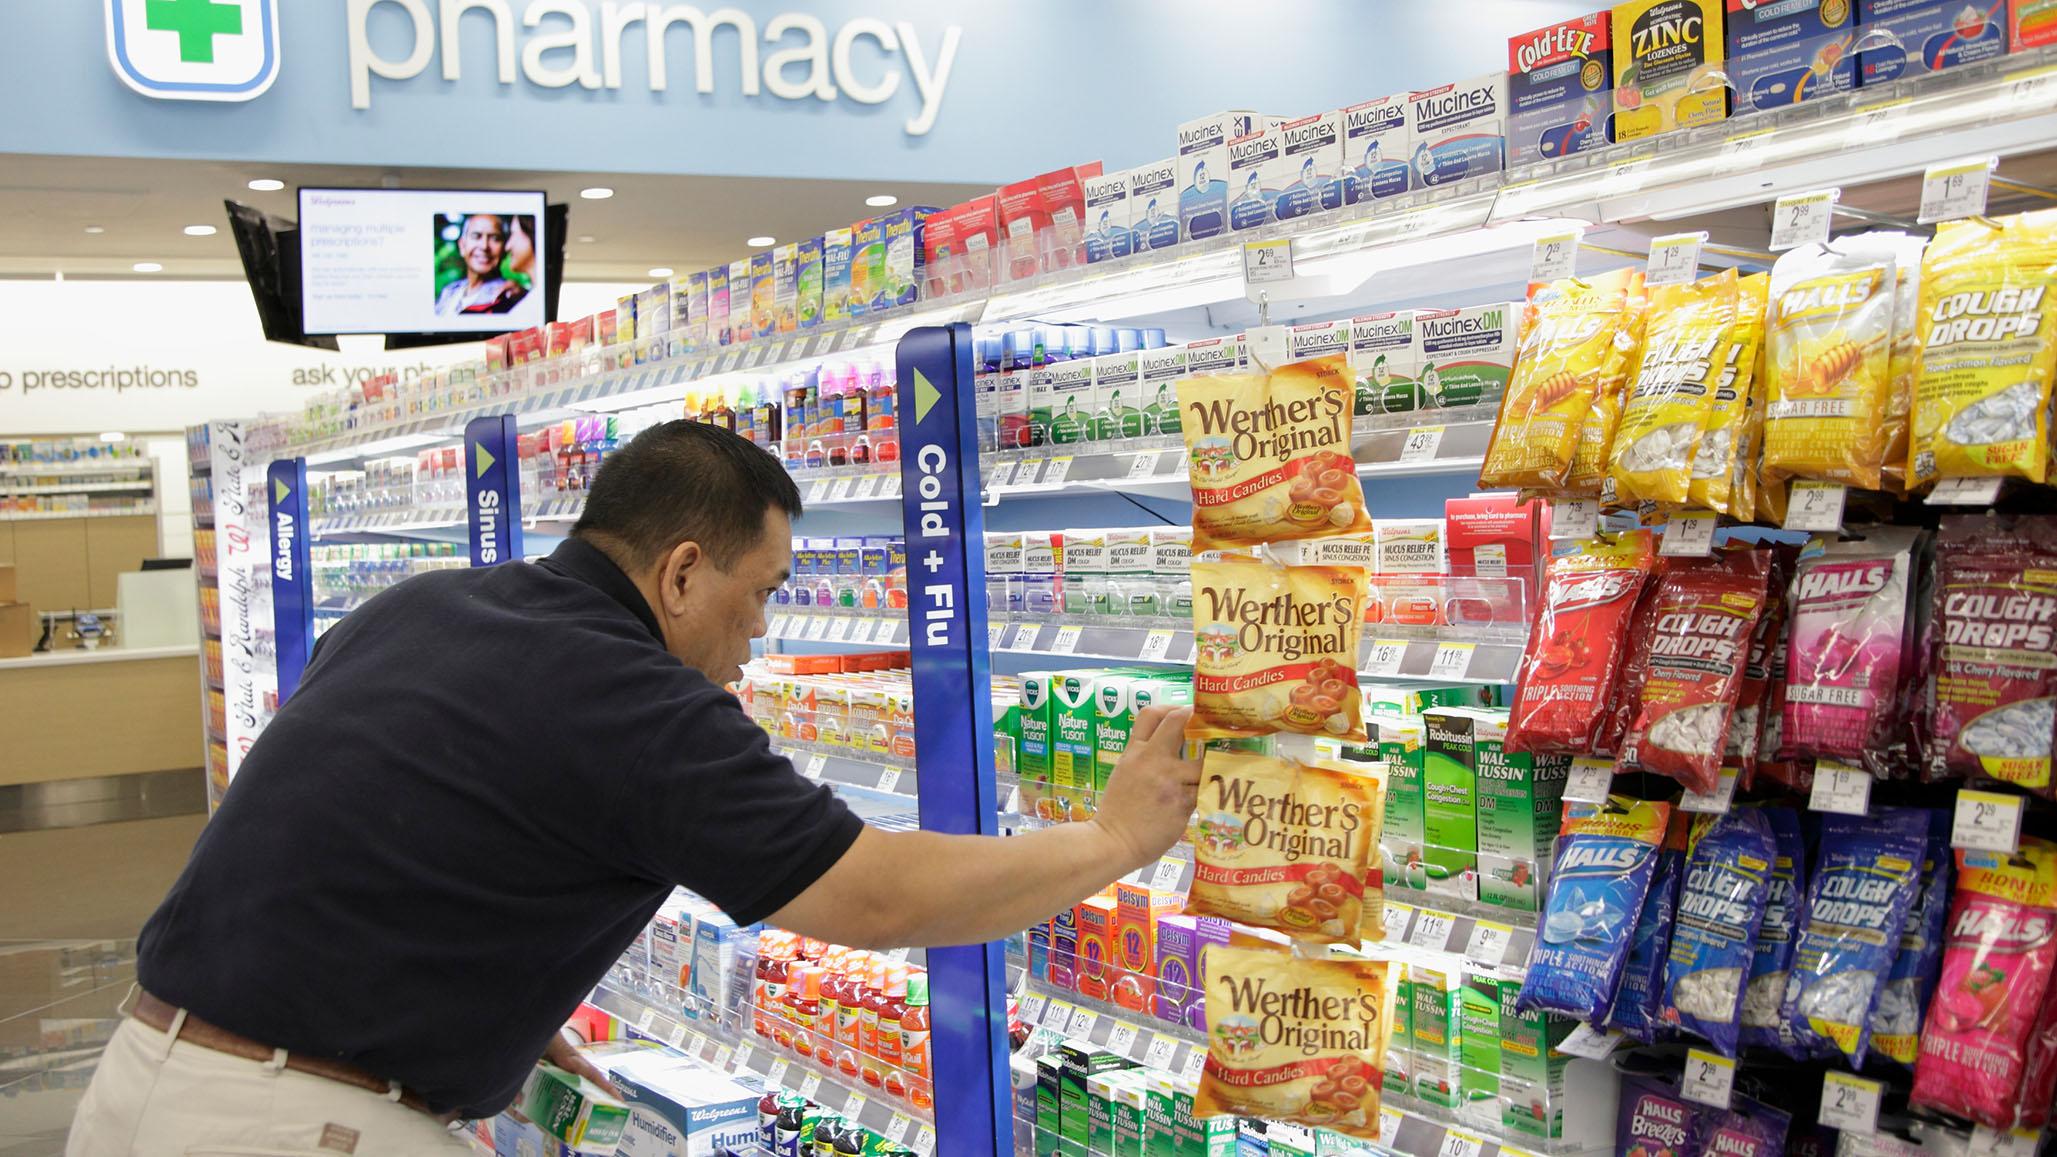 Pengutilan Walgreens: San Francisco Chronicle Tidak Ada Intinya